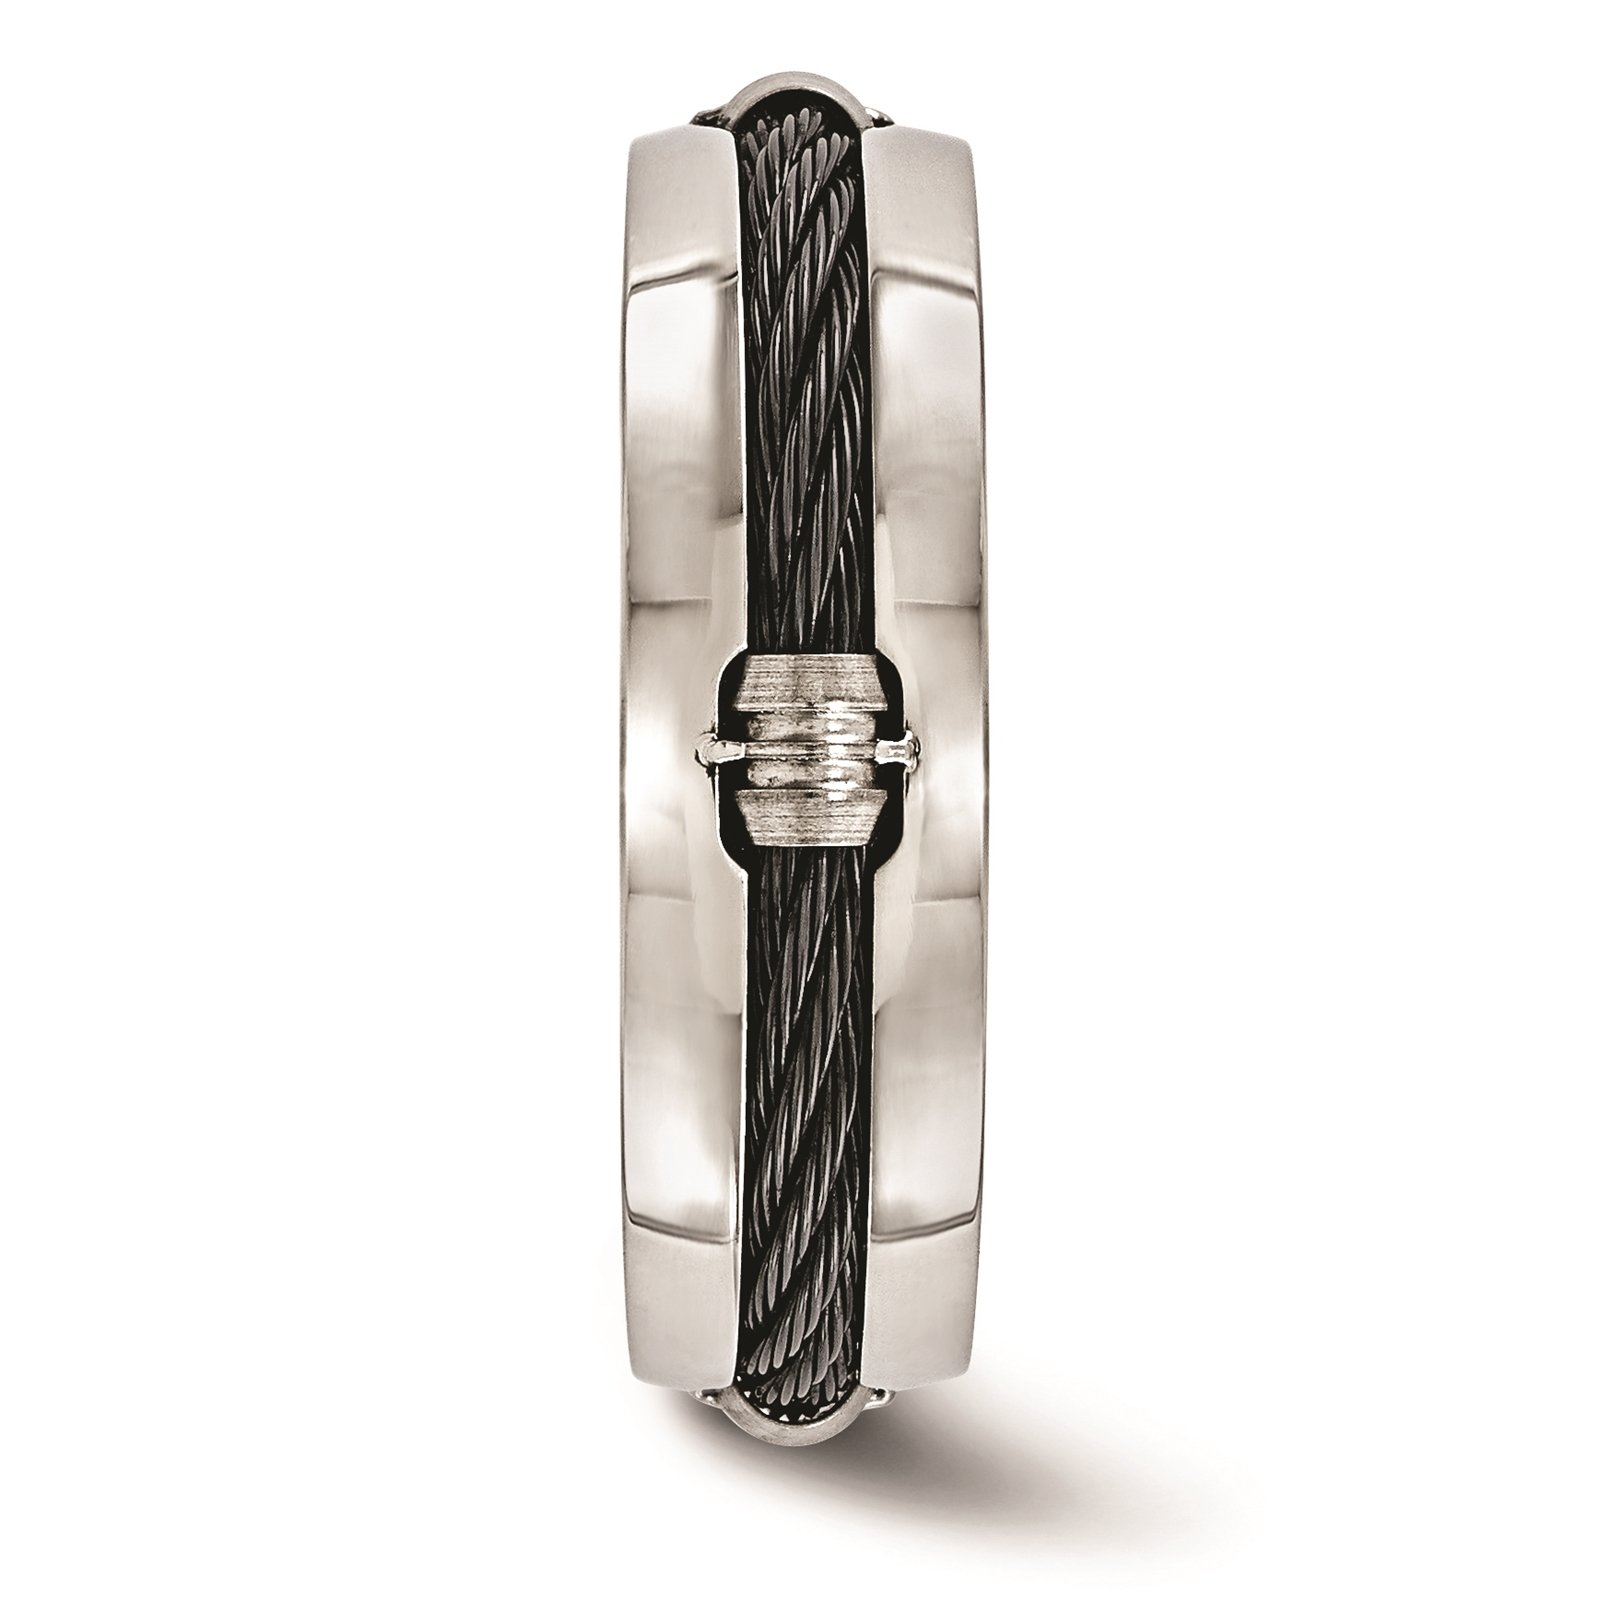 Titanium & Cable Polished 7mm Wedding Ring Band Size 8 by Edward Mirell by Venture Edward Mirell Titanium Bands (Image #3)